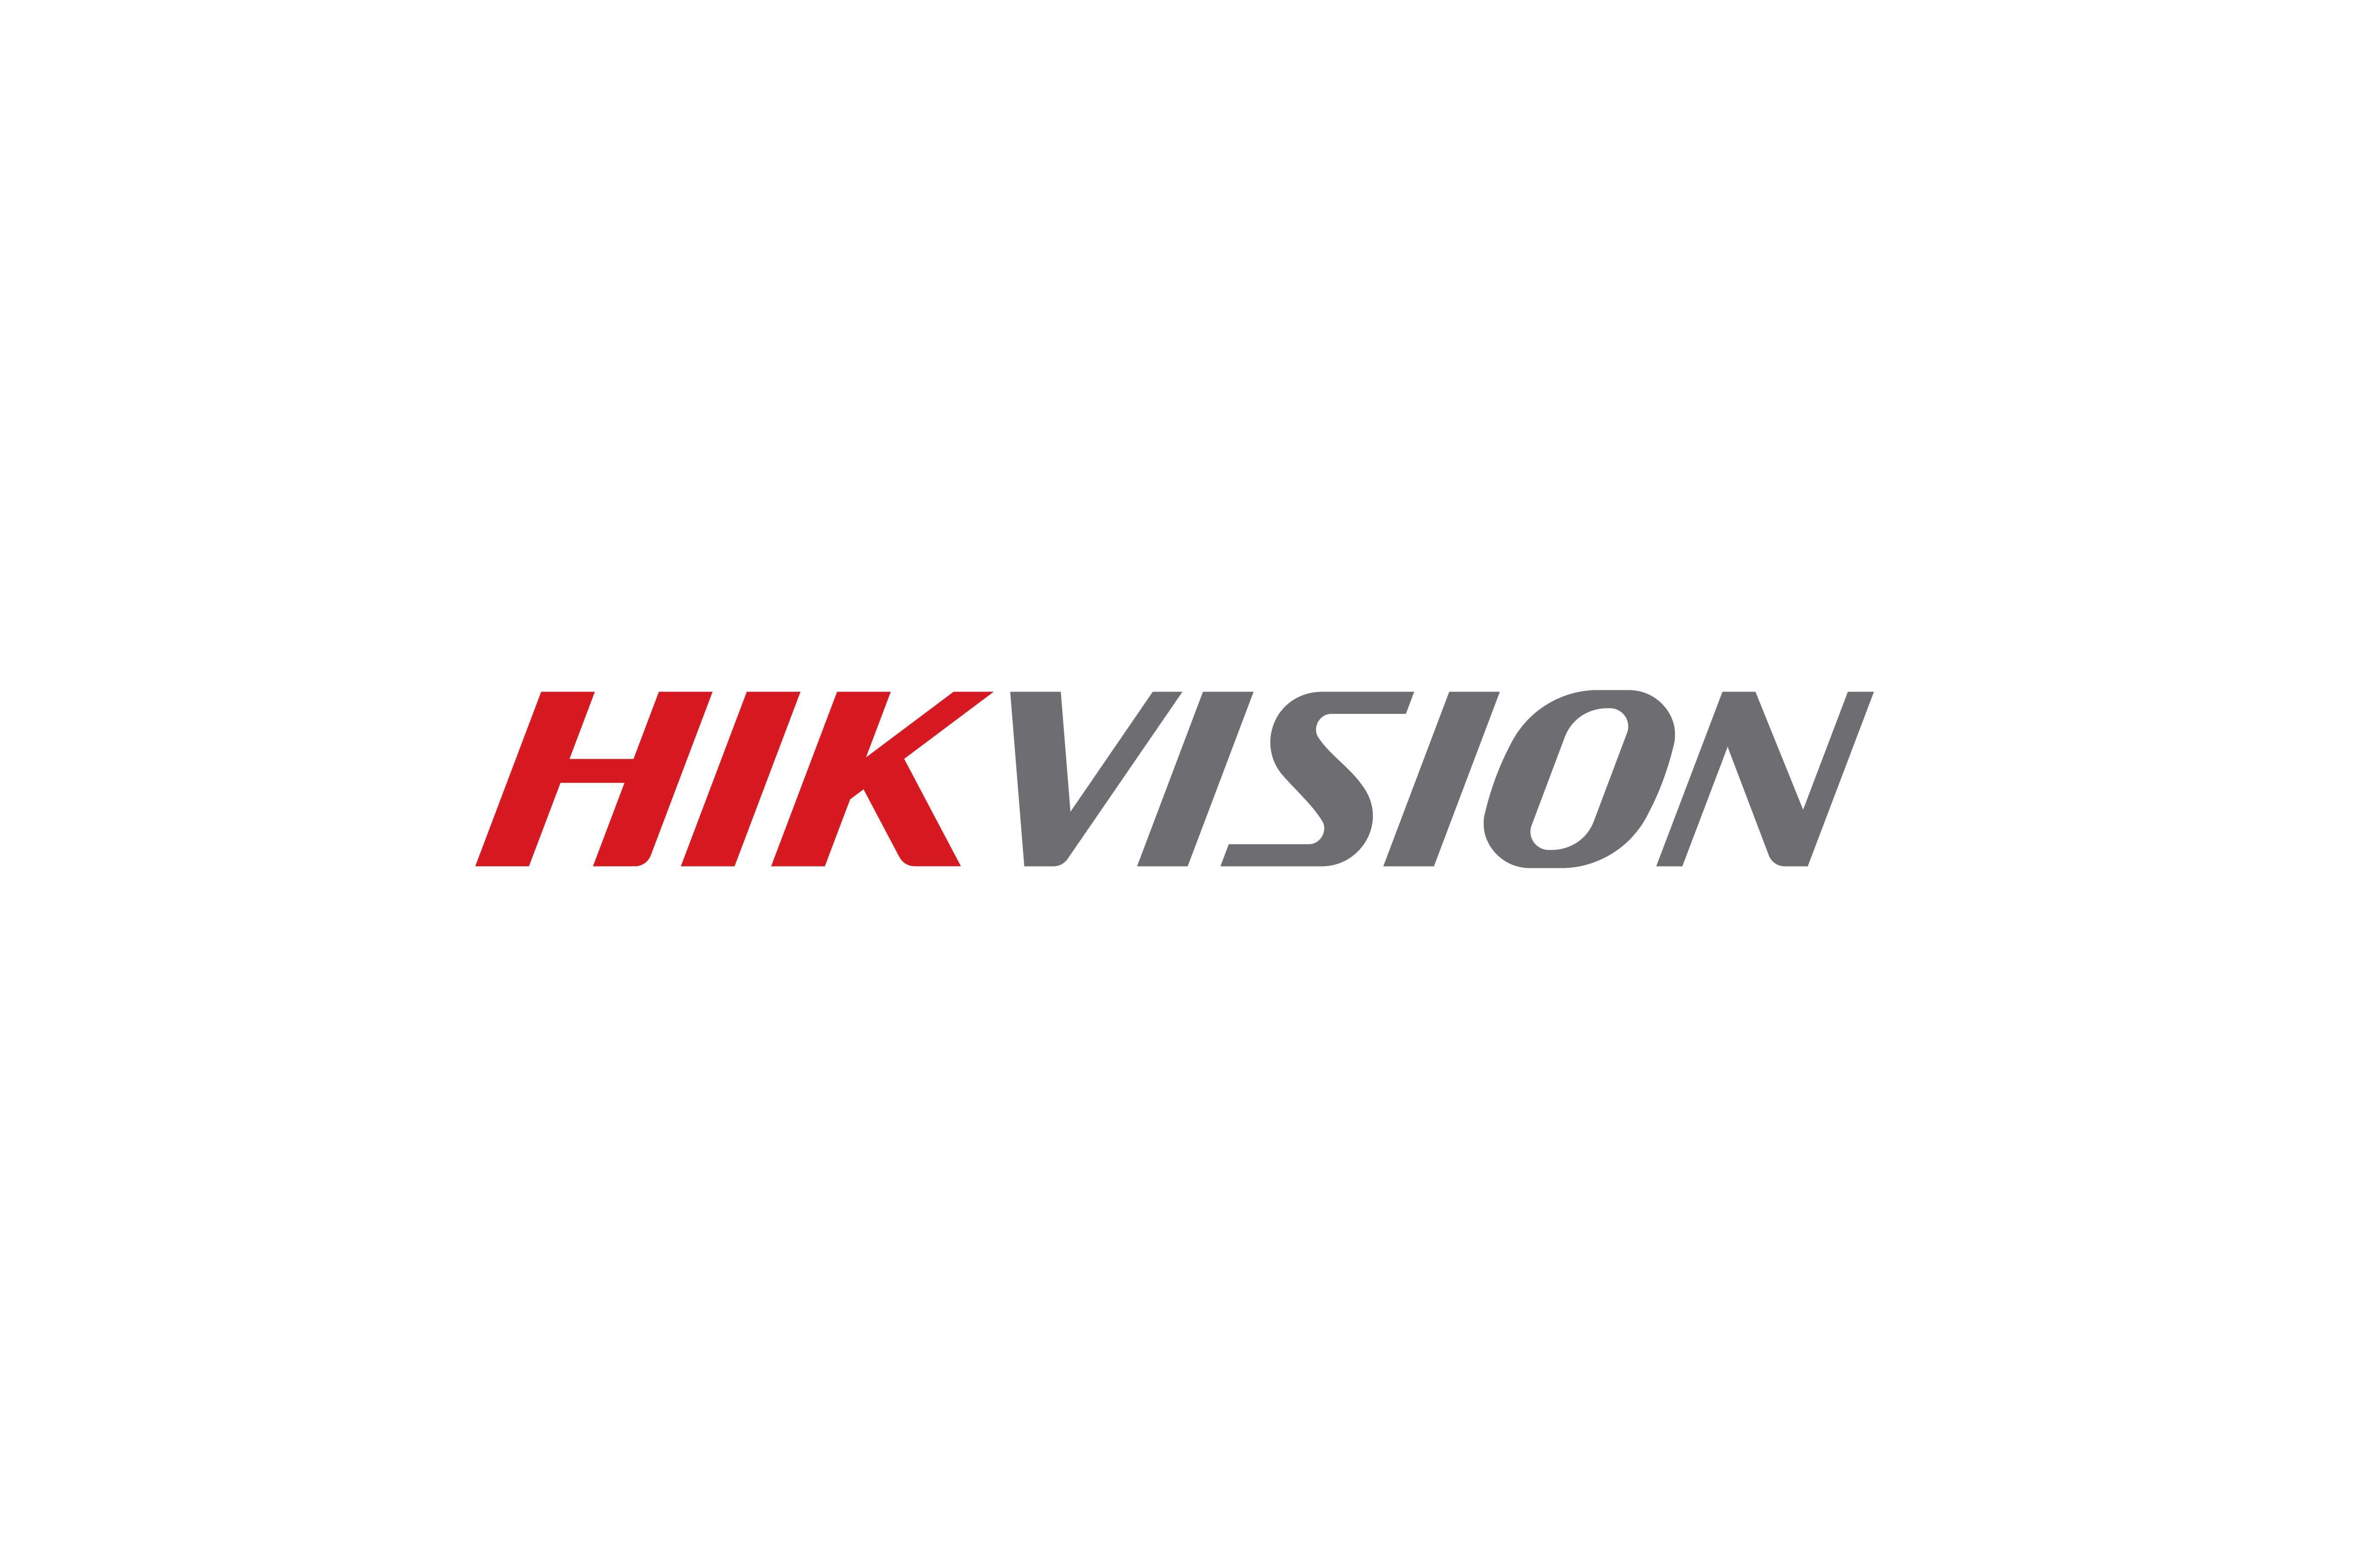 test_logo_hikvision_7